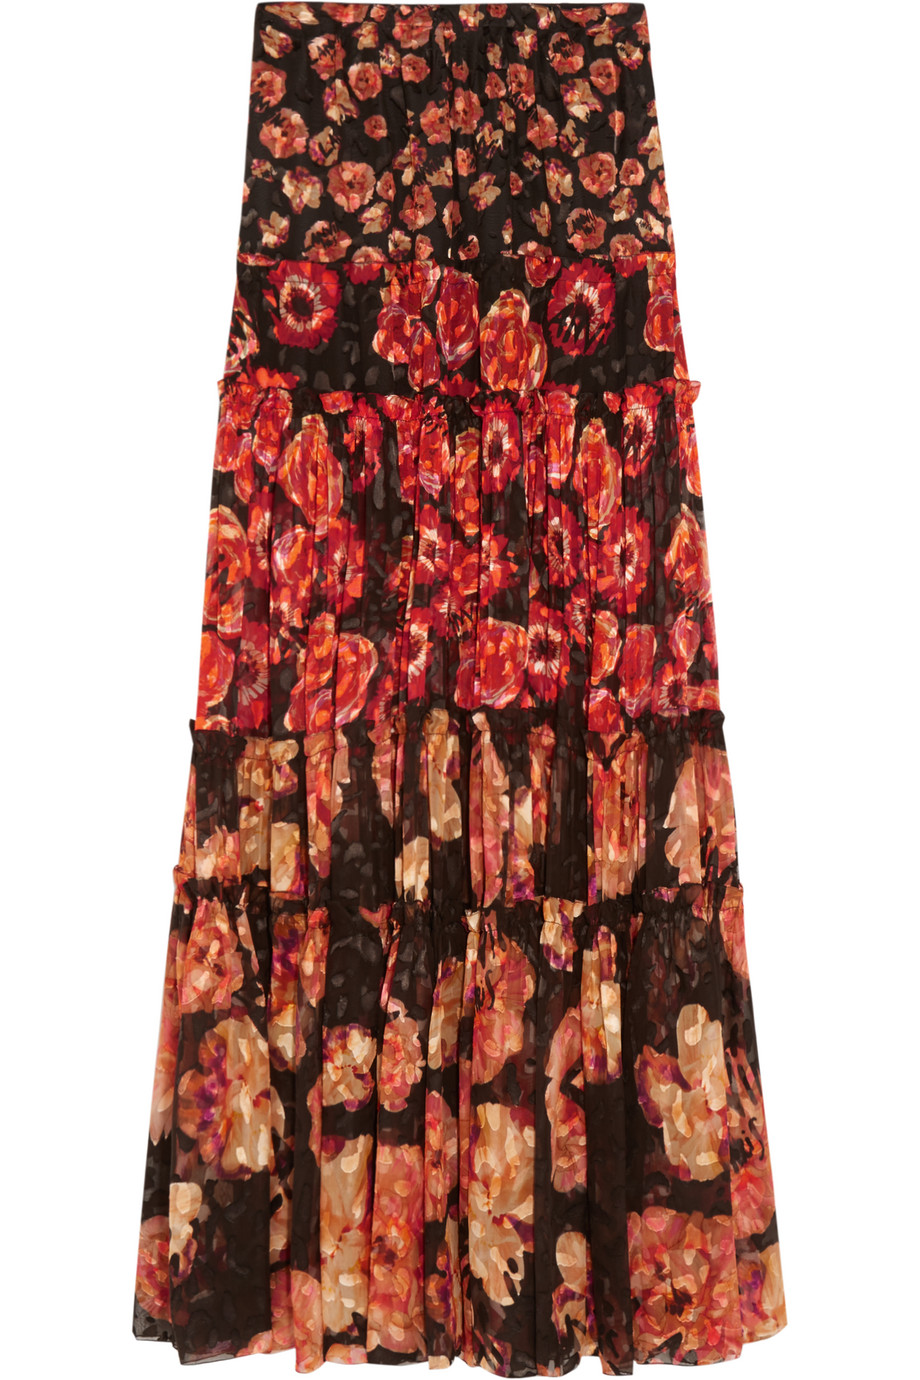 Lanvin Floral-Print Devoré-Chiffon Maxi Skirt, Burgundy/Red, Women's, Size: 42